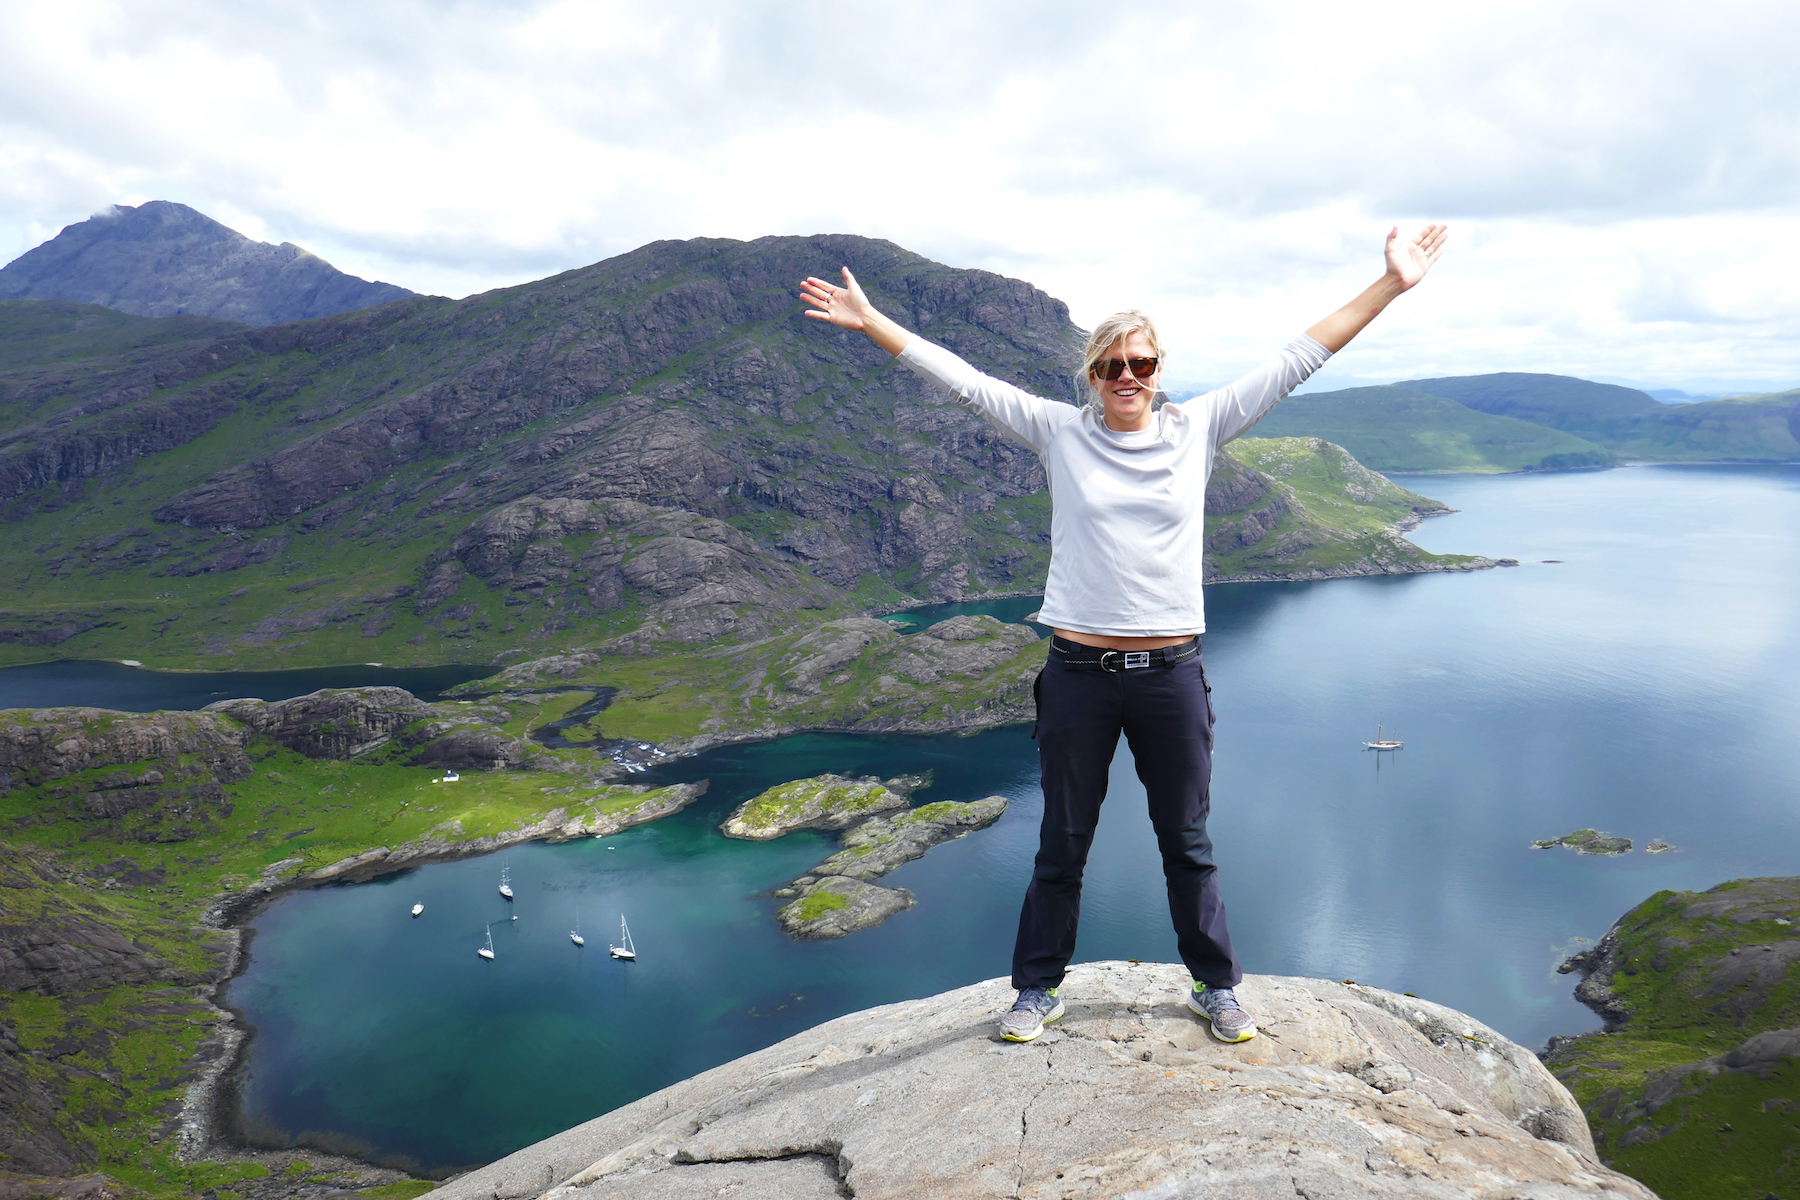 Hiking in Scotland! July 2017